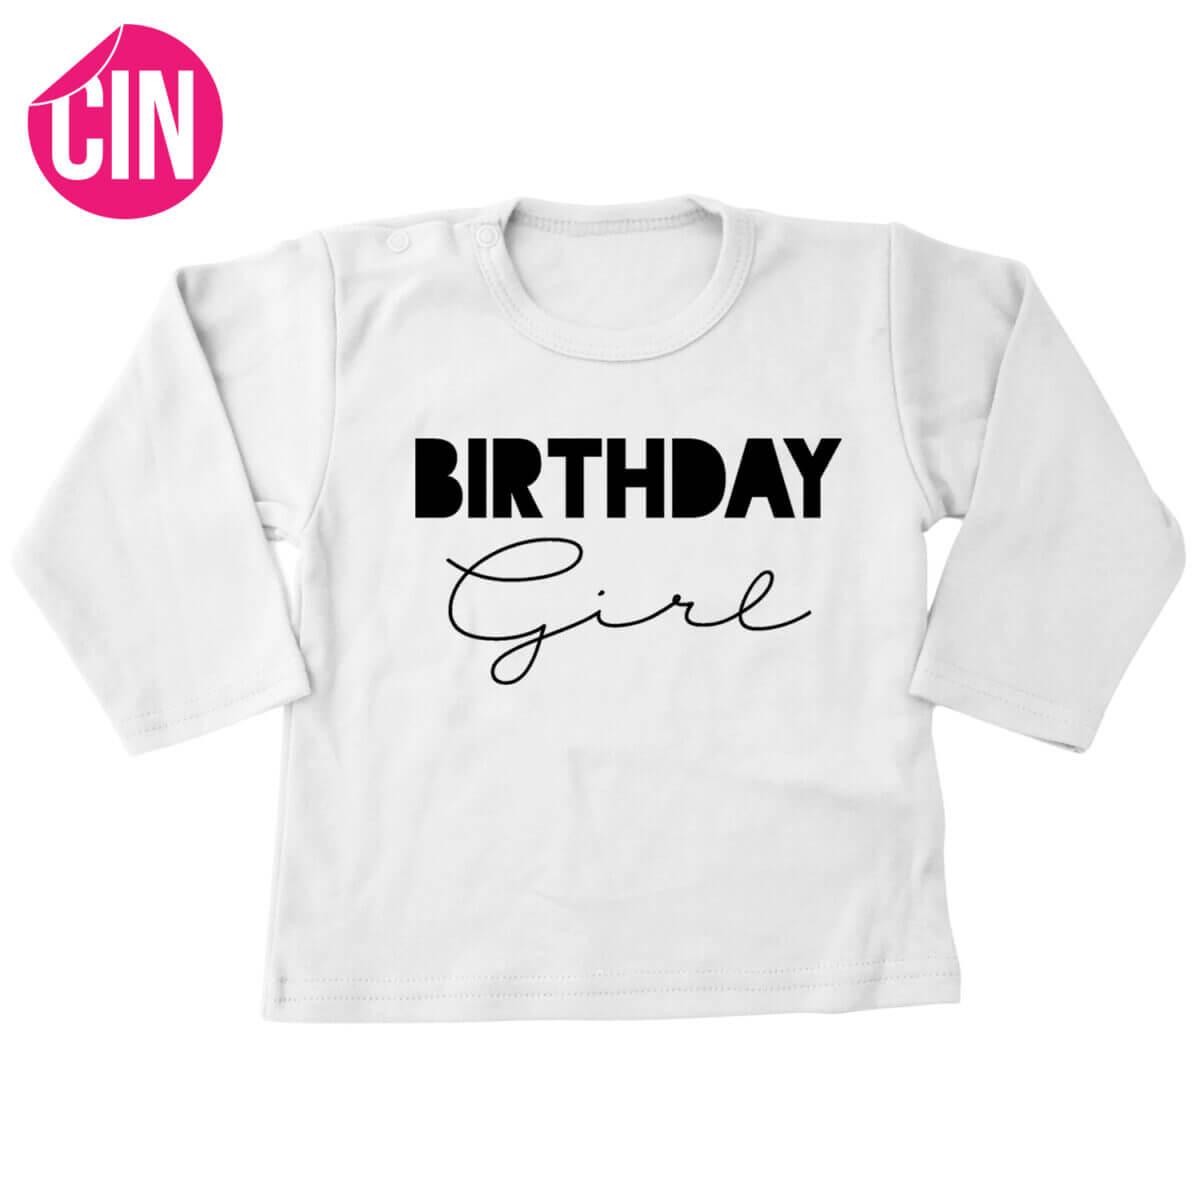 birthday girl t-shirt lange mouw cindysigns